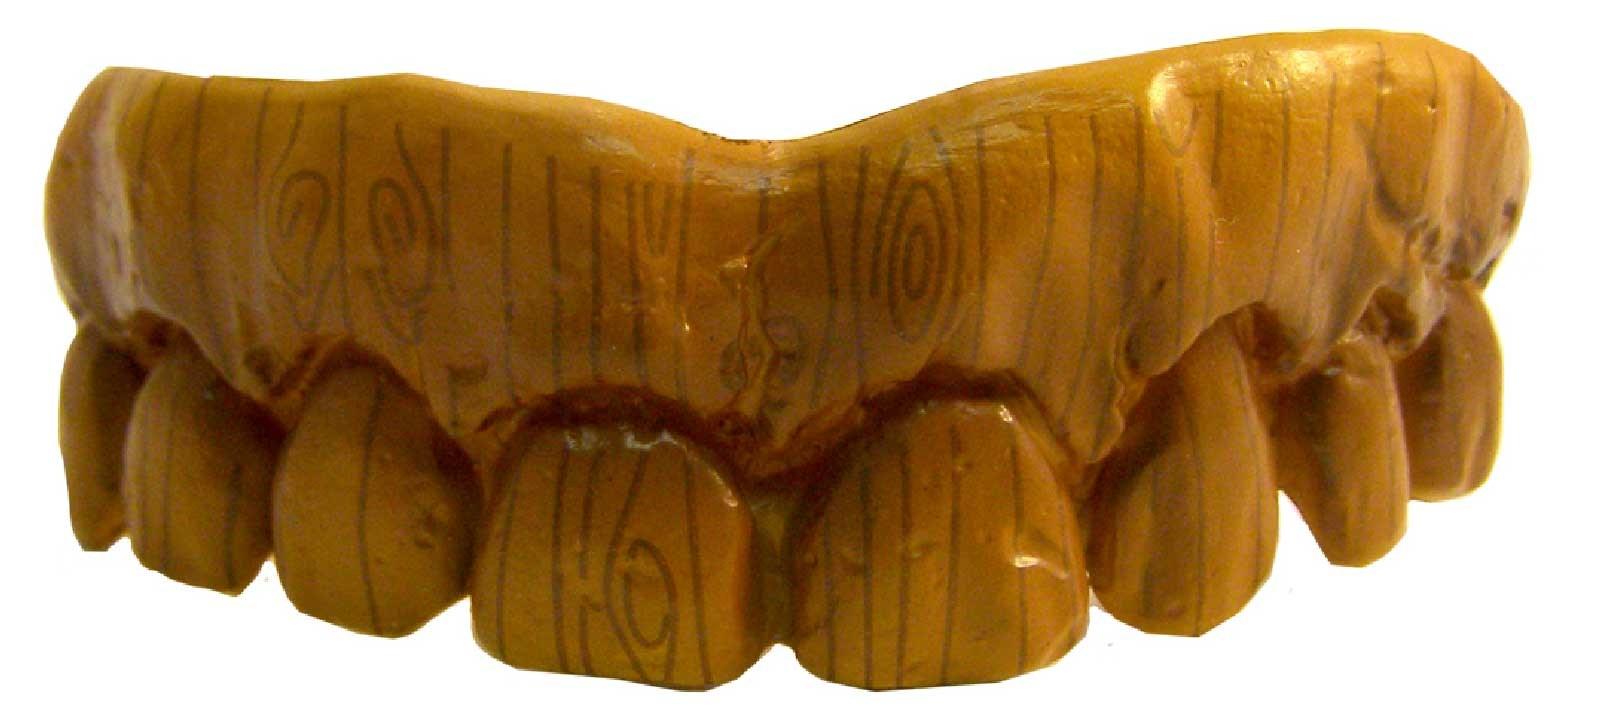 Image of Fake Wooden Teeth